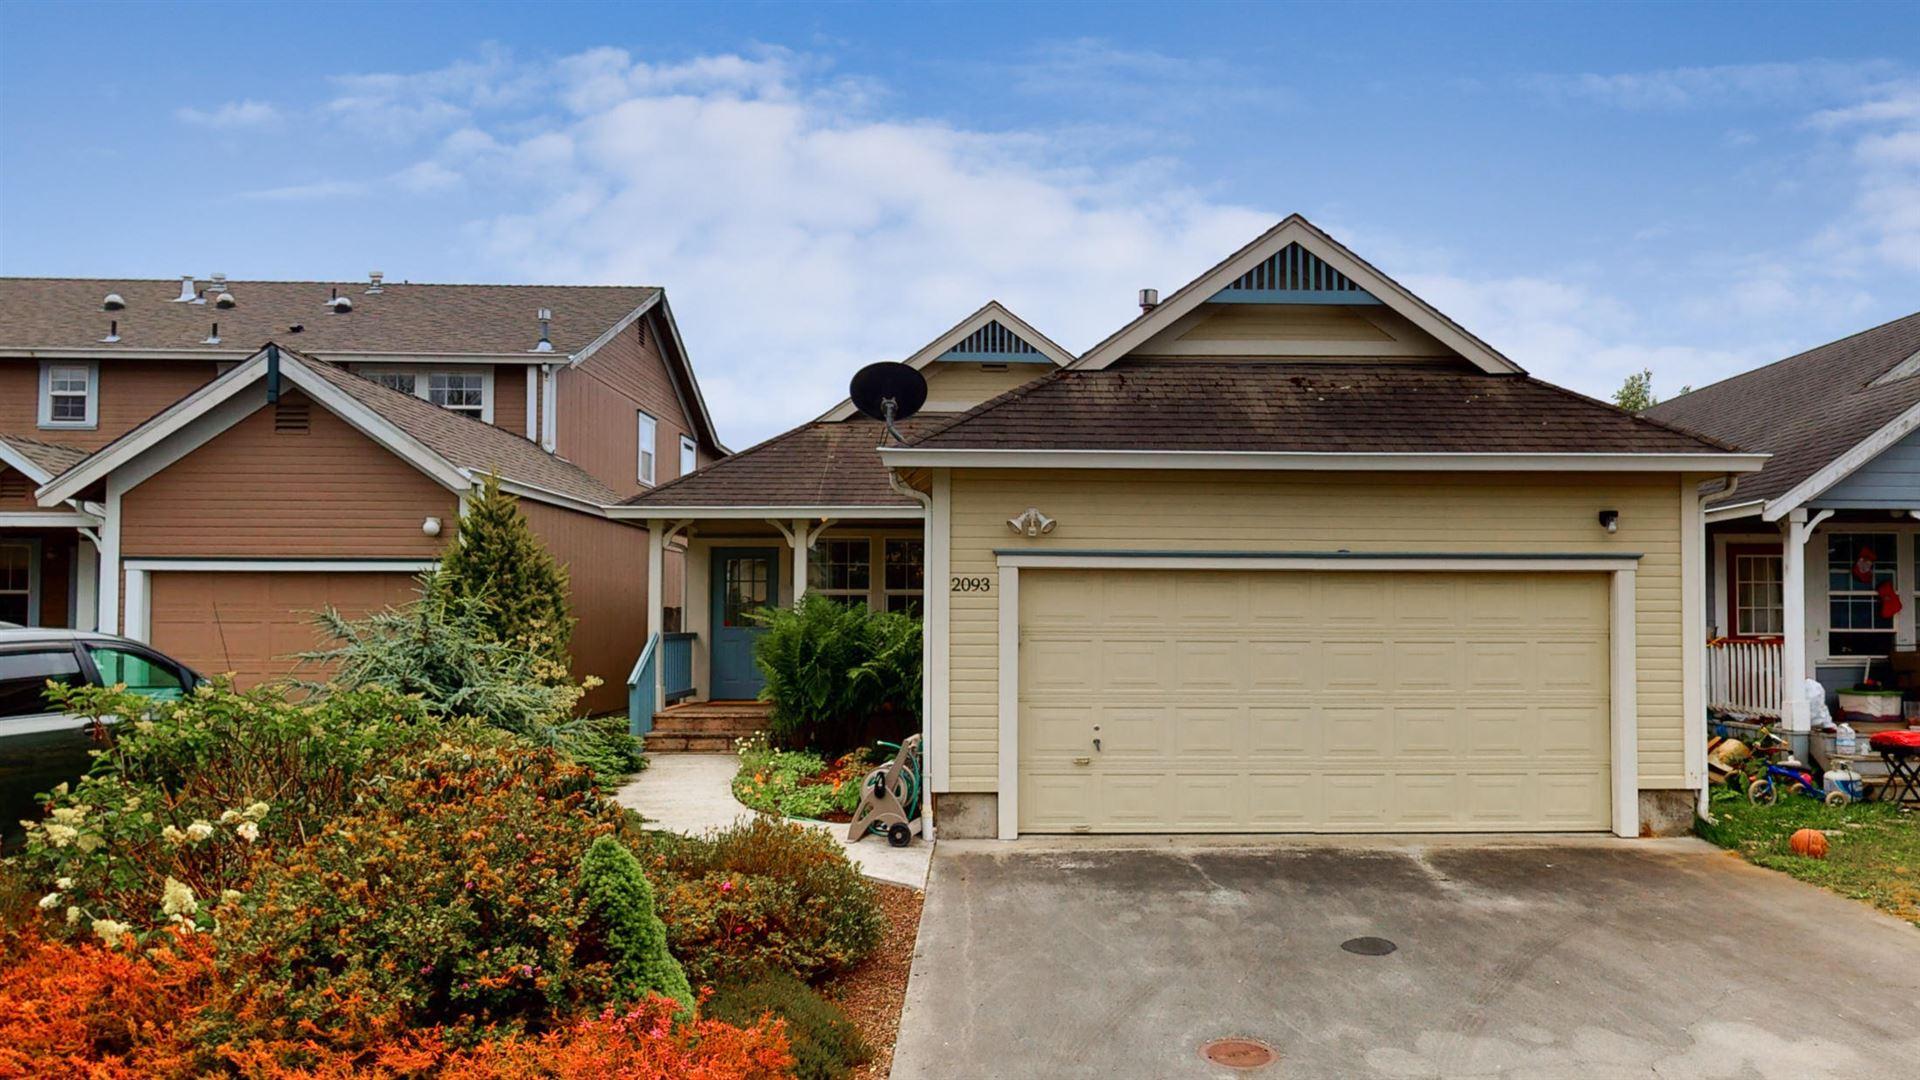 2093 Tina Court, Arcata, CA 95521 - MLS#: 259588